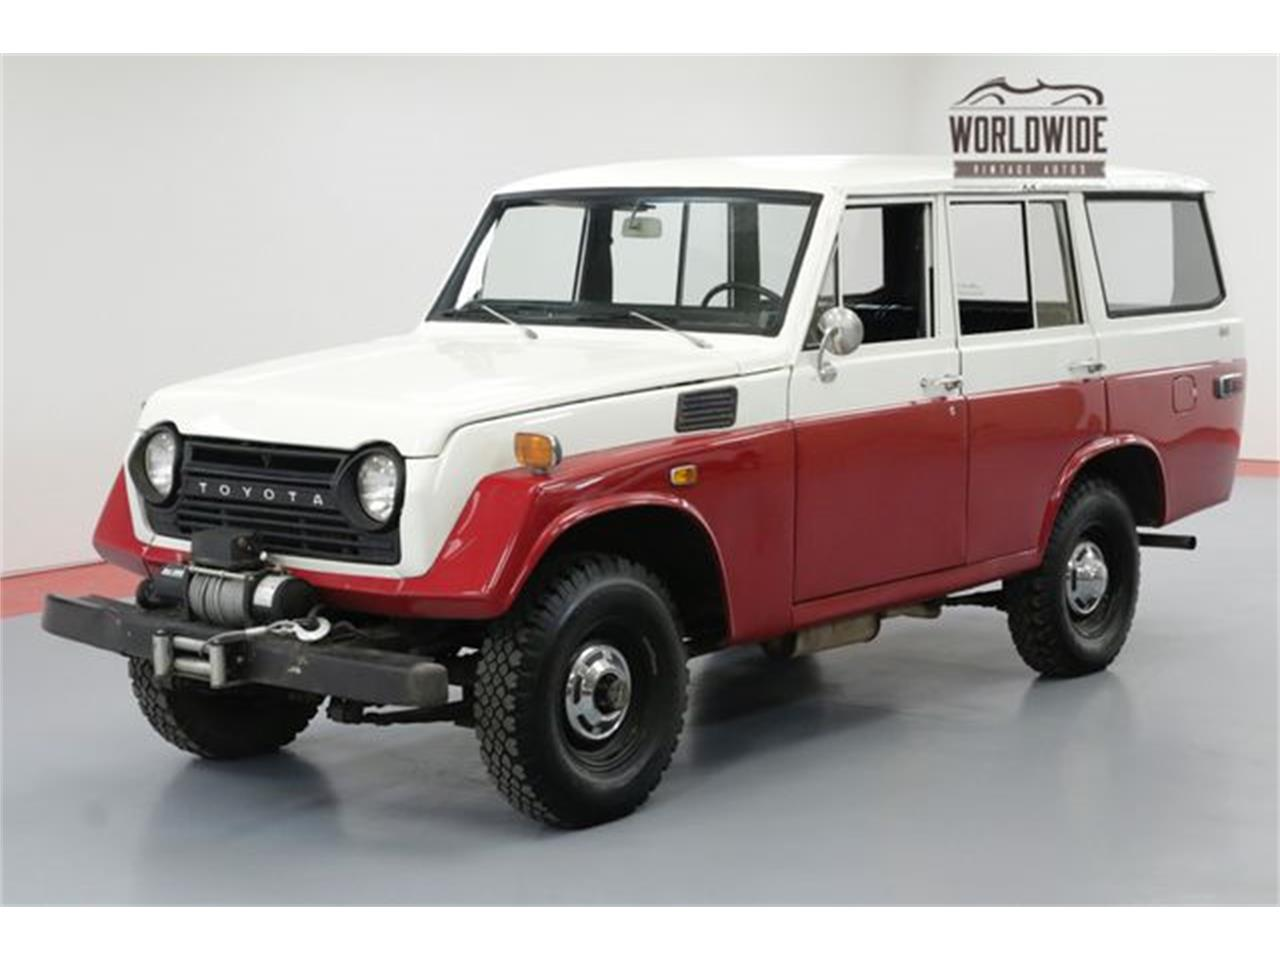 1973 Toyota Land Cruiser Fj For Sale Cc 1090310 Fj55 Large Picture Of 73 Ndae